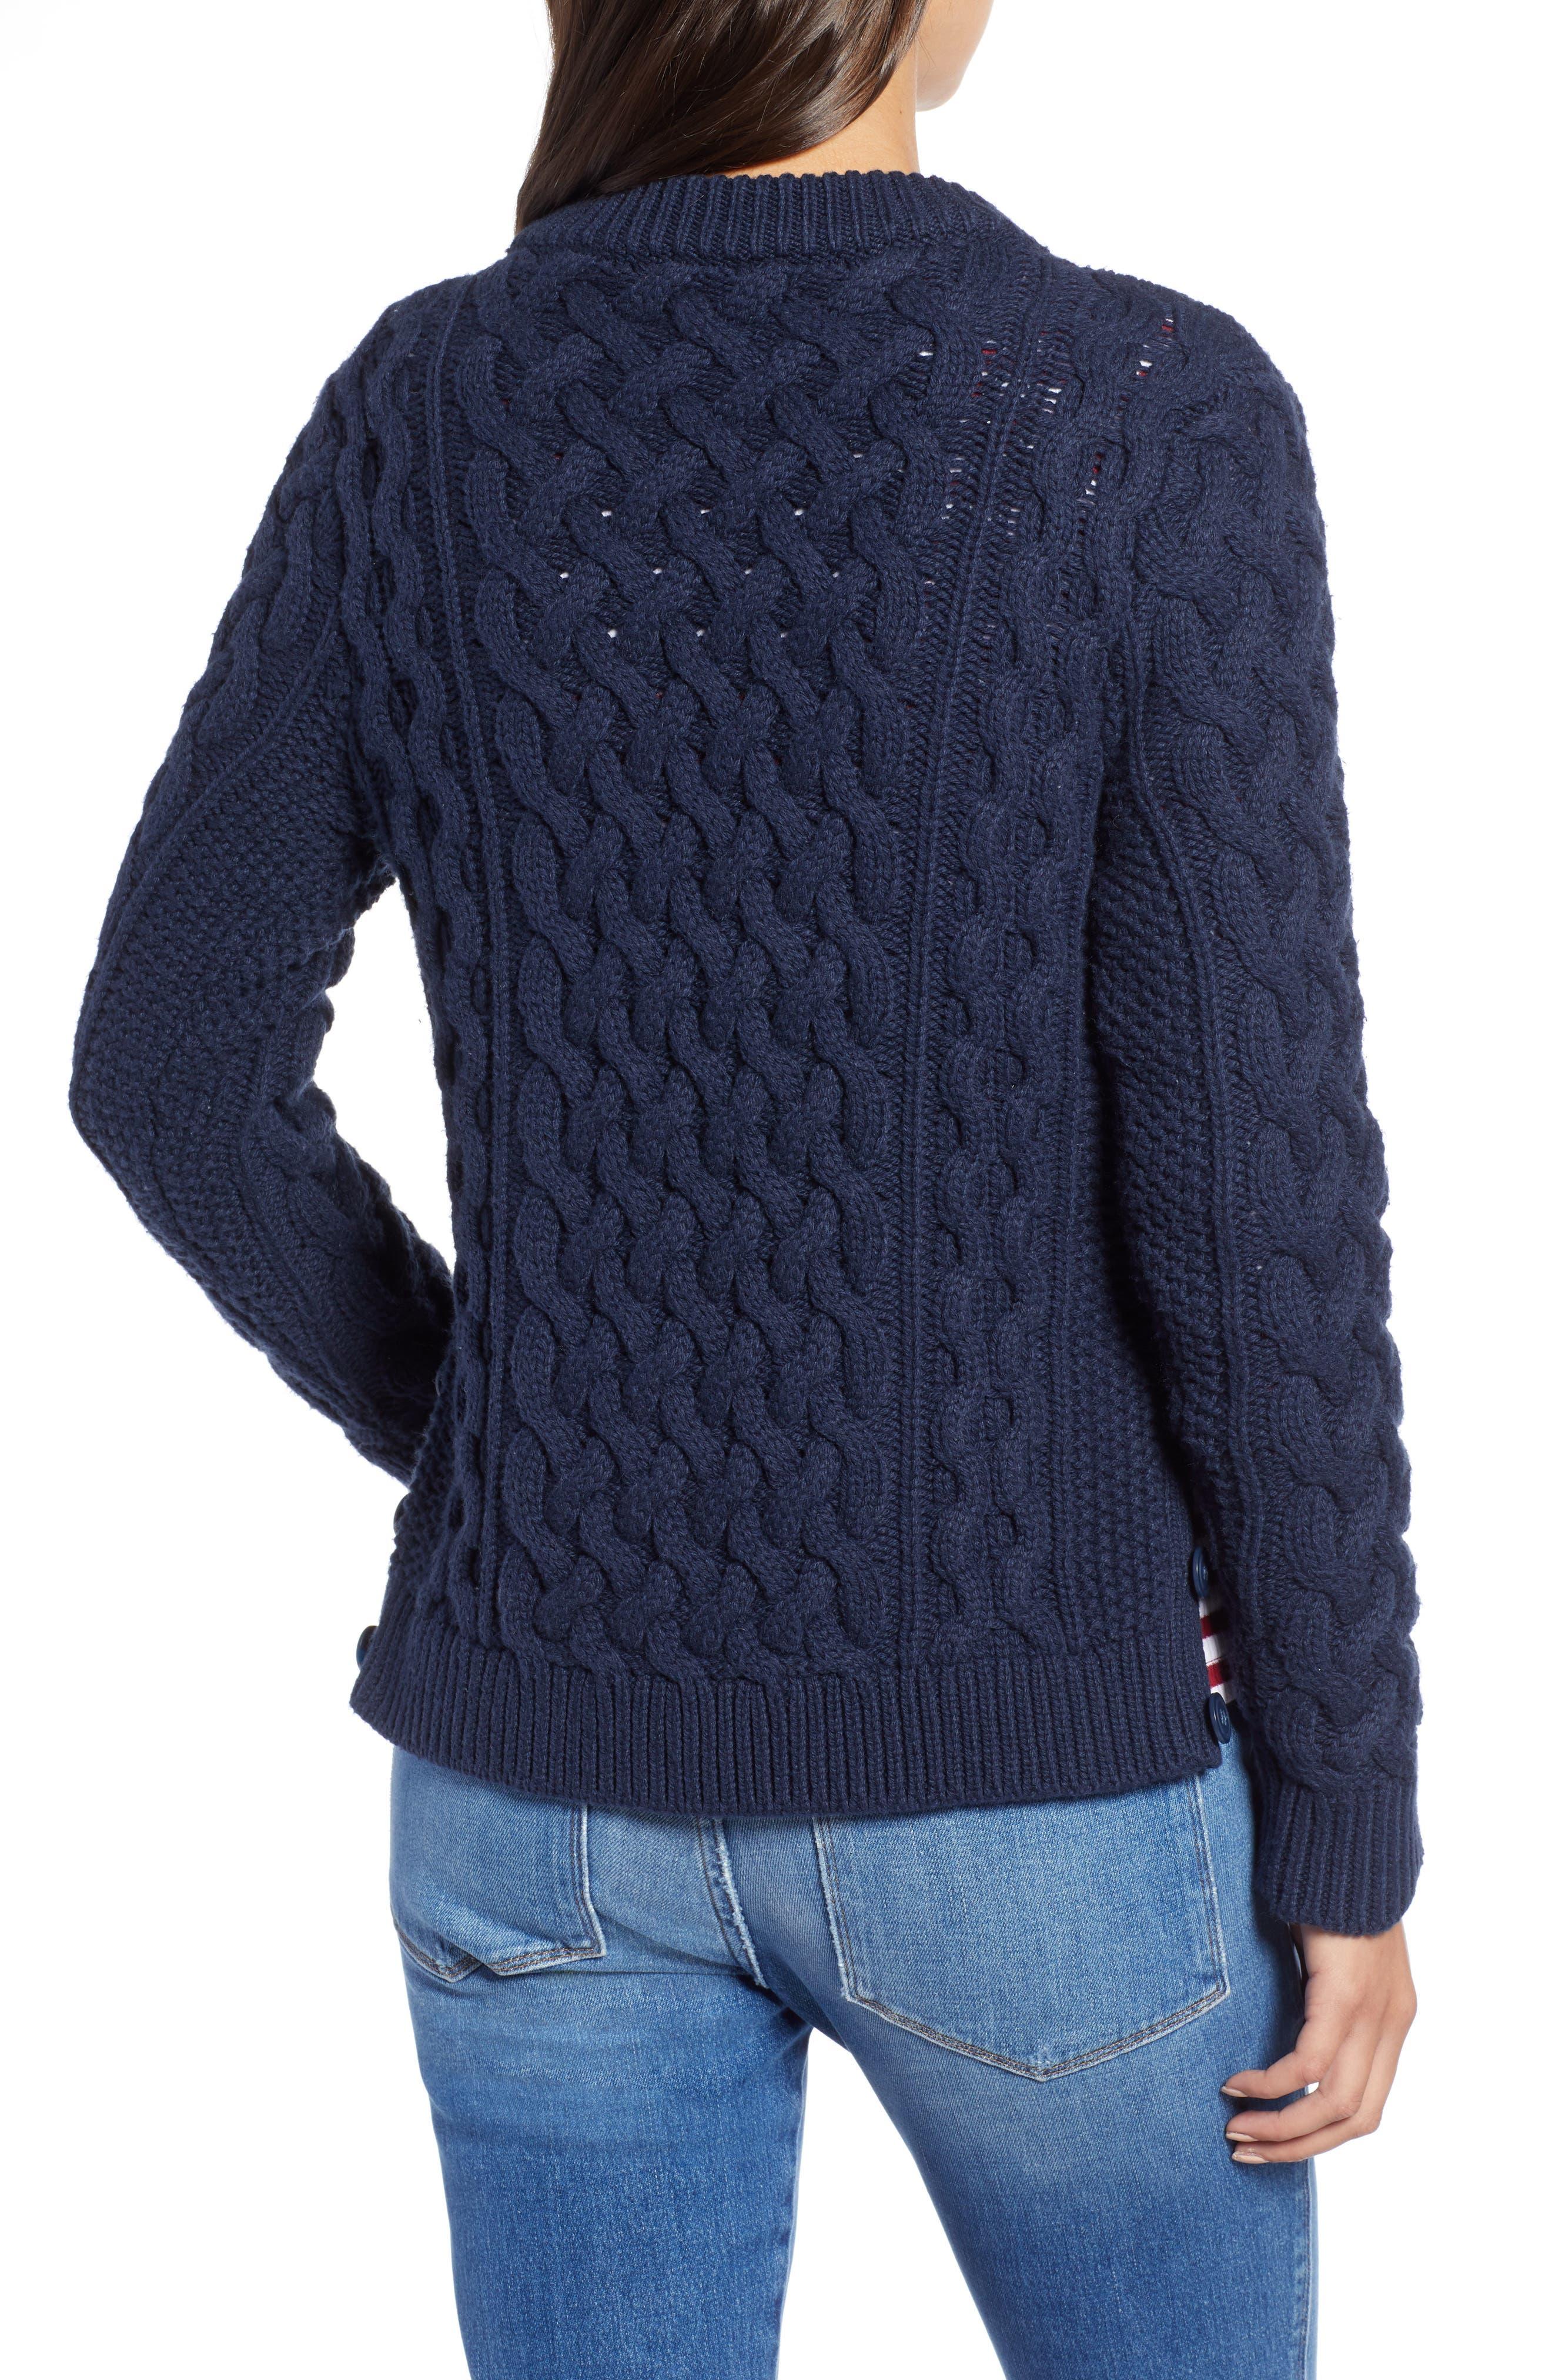 Fisherwoman Crewneck Pullover Sweater,                             Alternate thumbnail 2, color,                             NAVY BLAZER